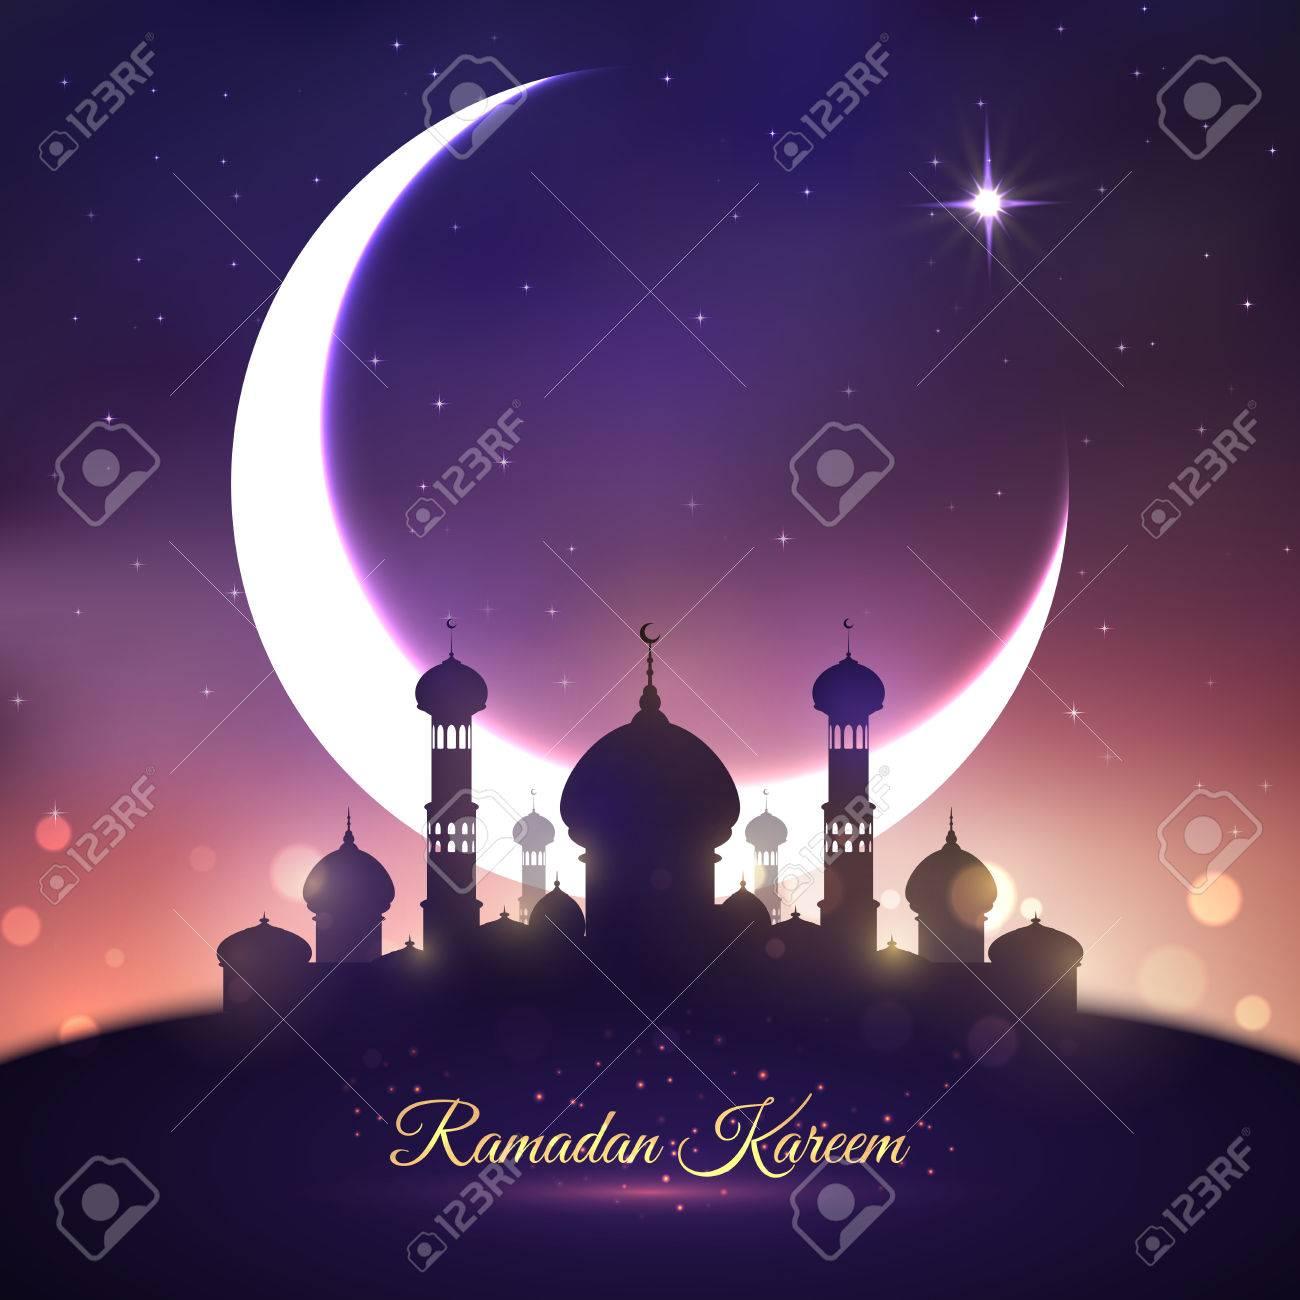 Ramadan kareem eid mubarak greeting card design royalty free ramadan kareem eid mubarak greeting card design stock vector 78077006 m4hsunfo